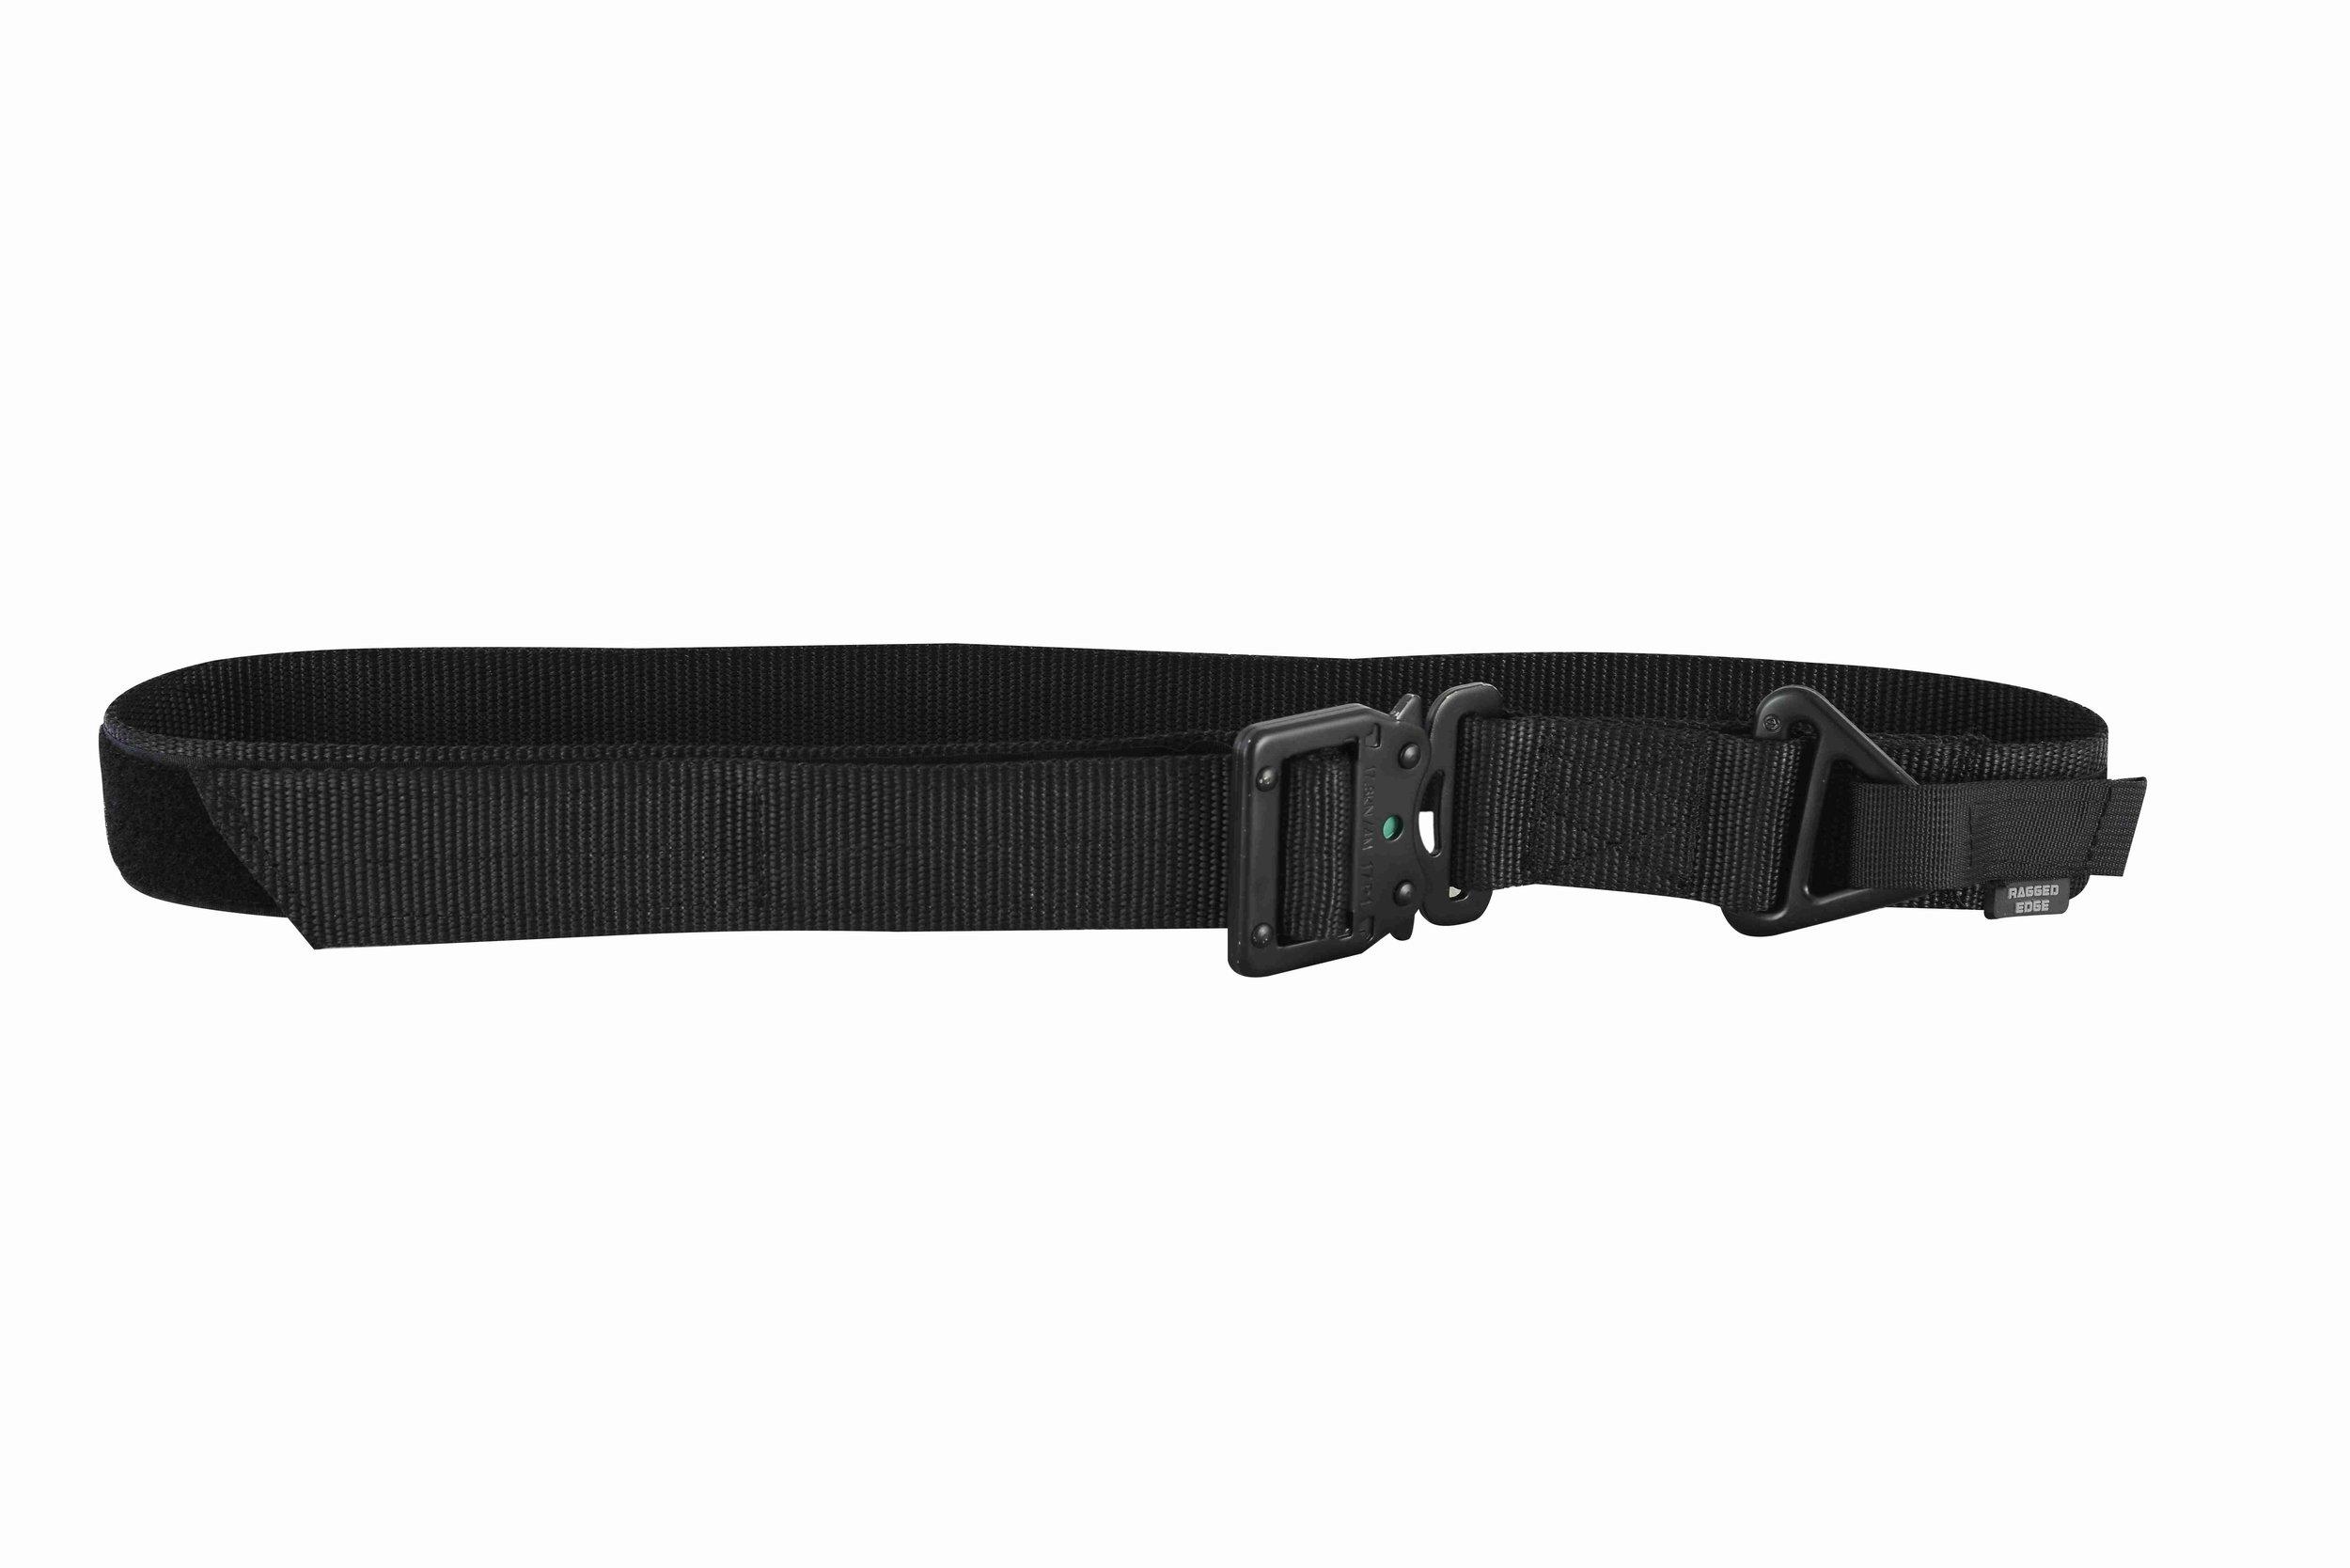 2051 Rigger's Belt W_Cobra Buckle.jpg